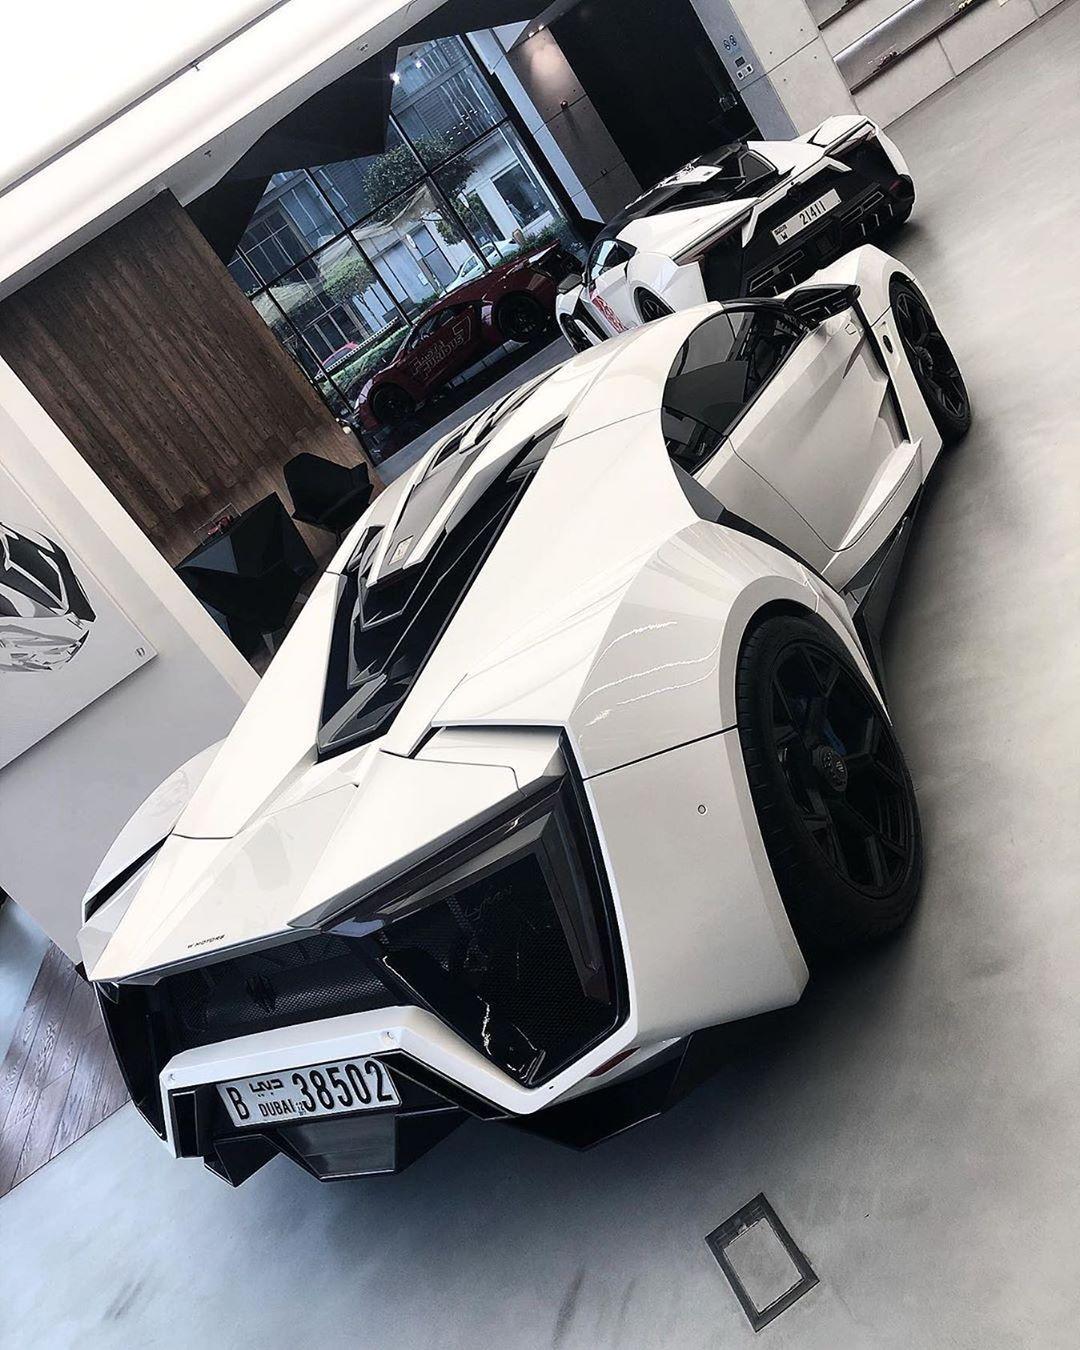 L�ks Arabalar Duvar Ka��d�  #cars #luxurycars #sportcars #conceptcars #motorcycles #trucks